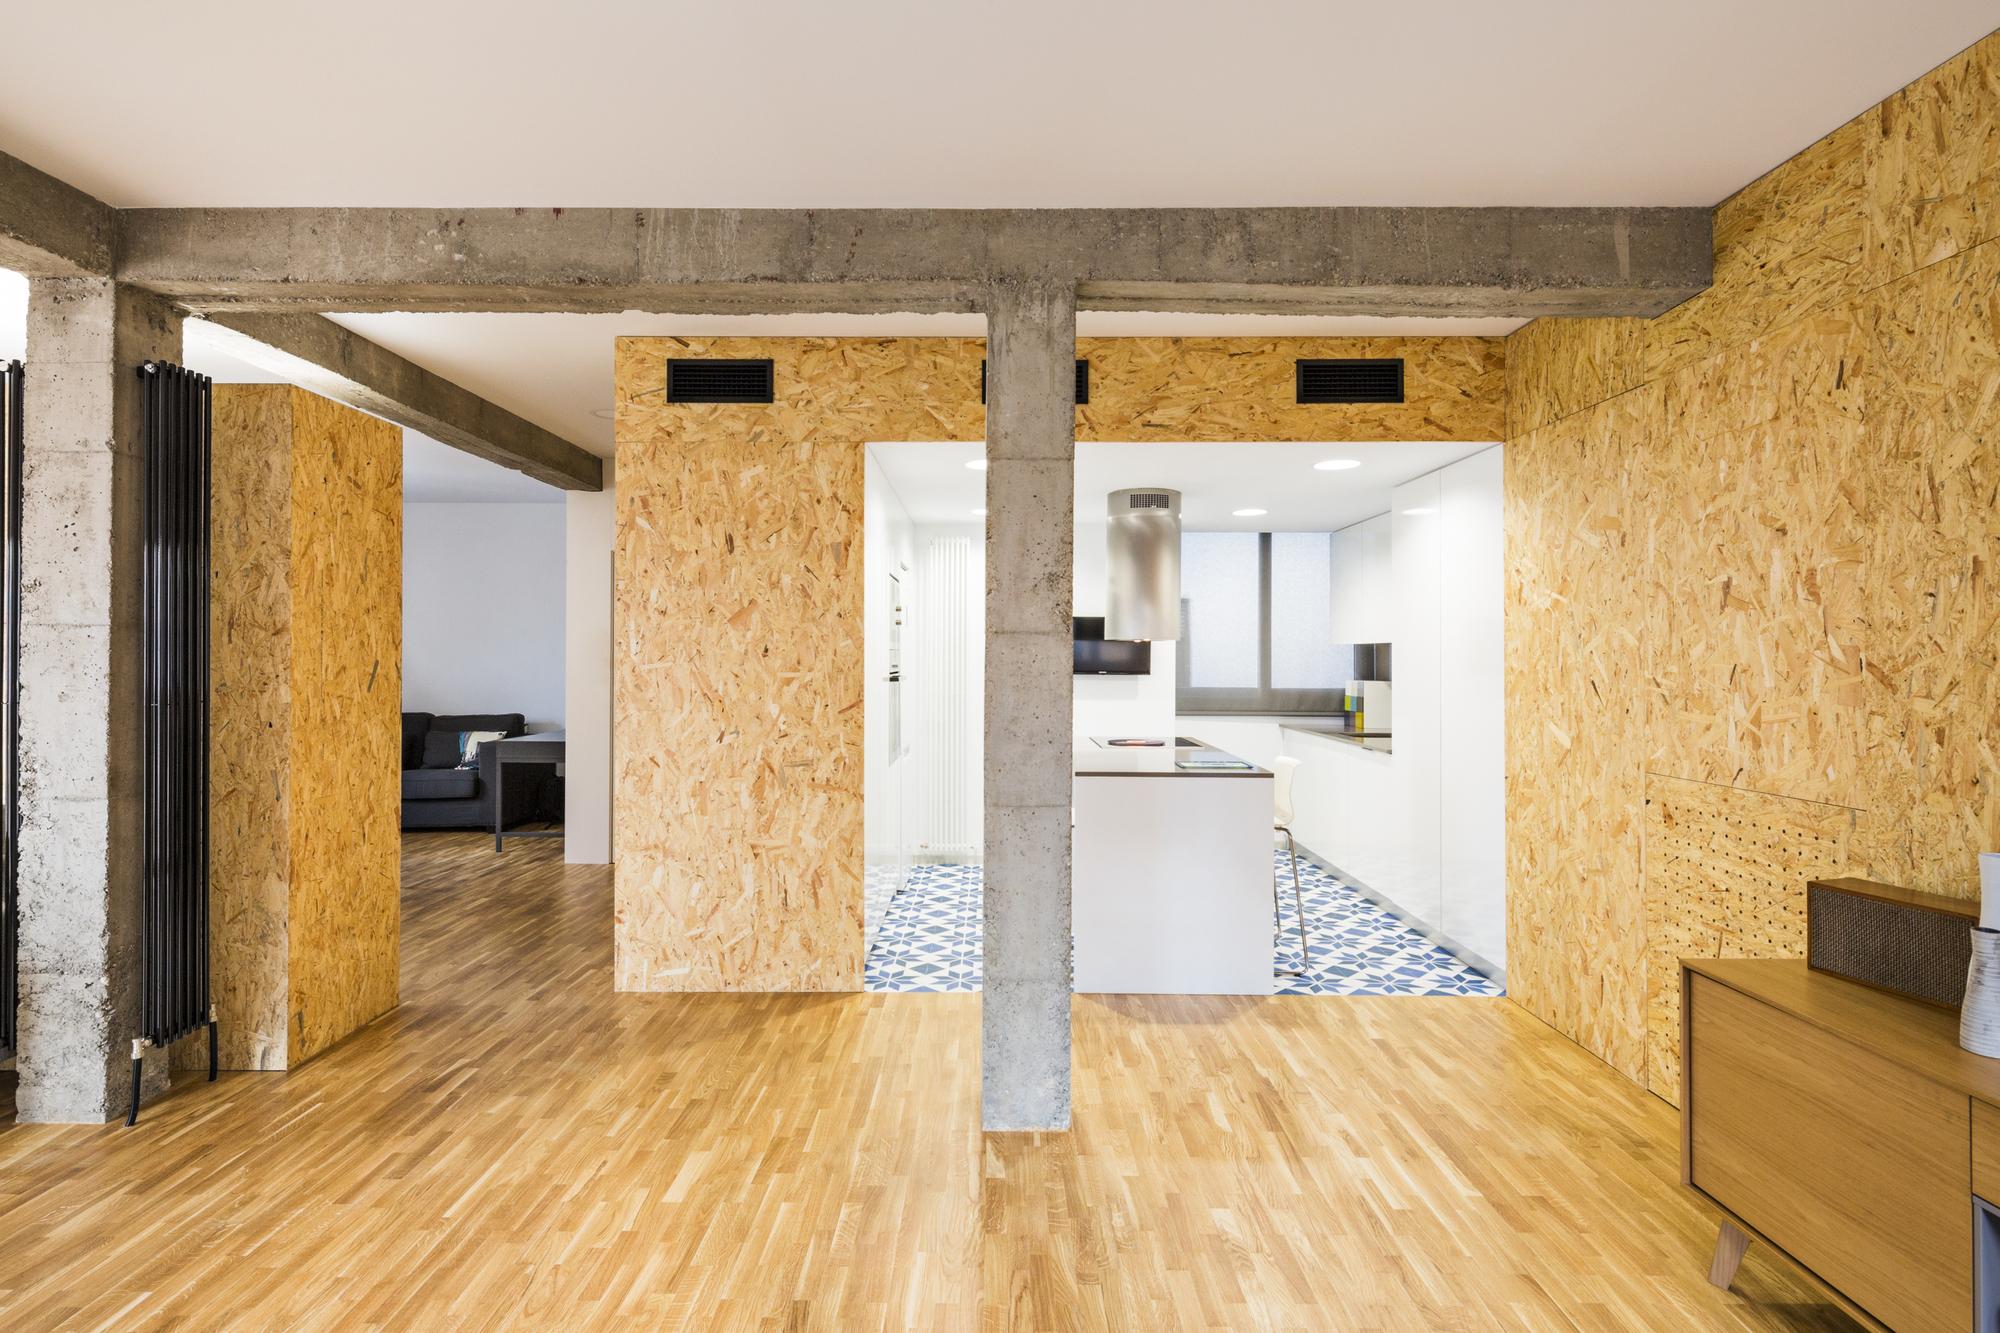 cadam apartment renovation for a musician dtr studio arquitectos archdaily. Black Bedroom Furniture Sets. Home Design Ideas